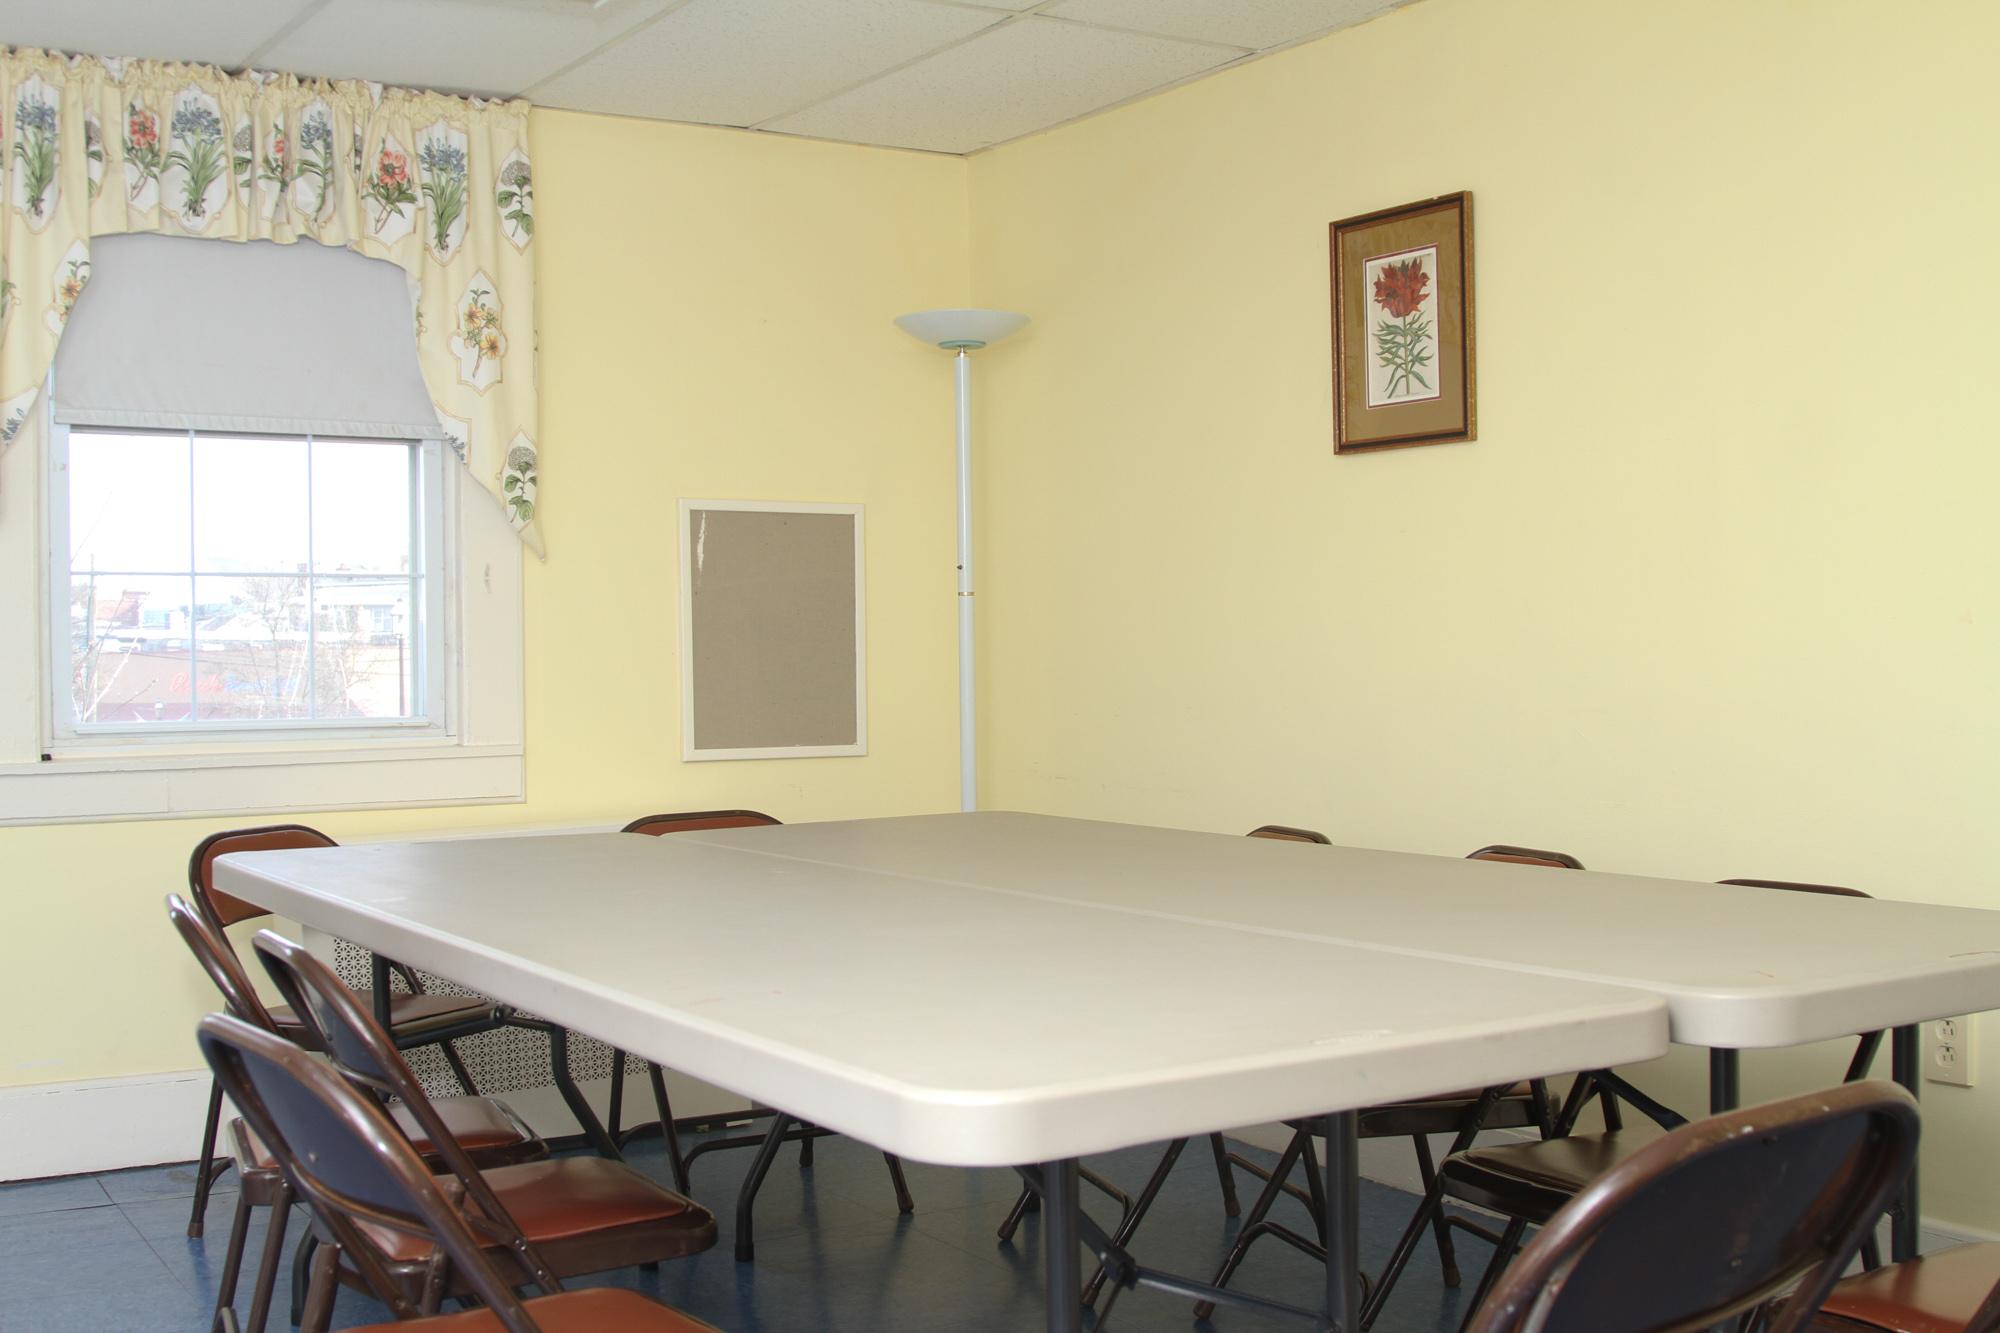 6 Meeting Room - Rental Space - Room - Thursday Morning Club